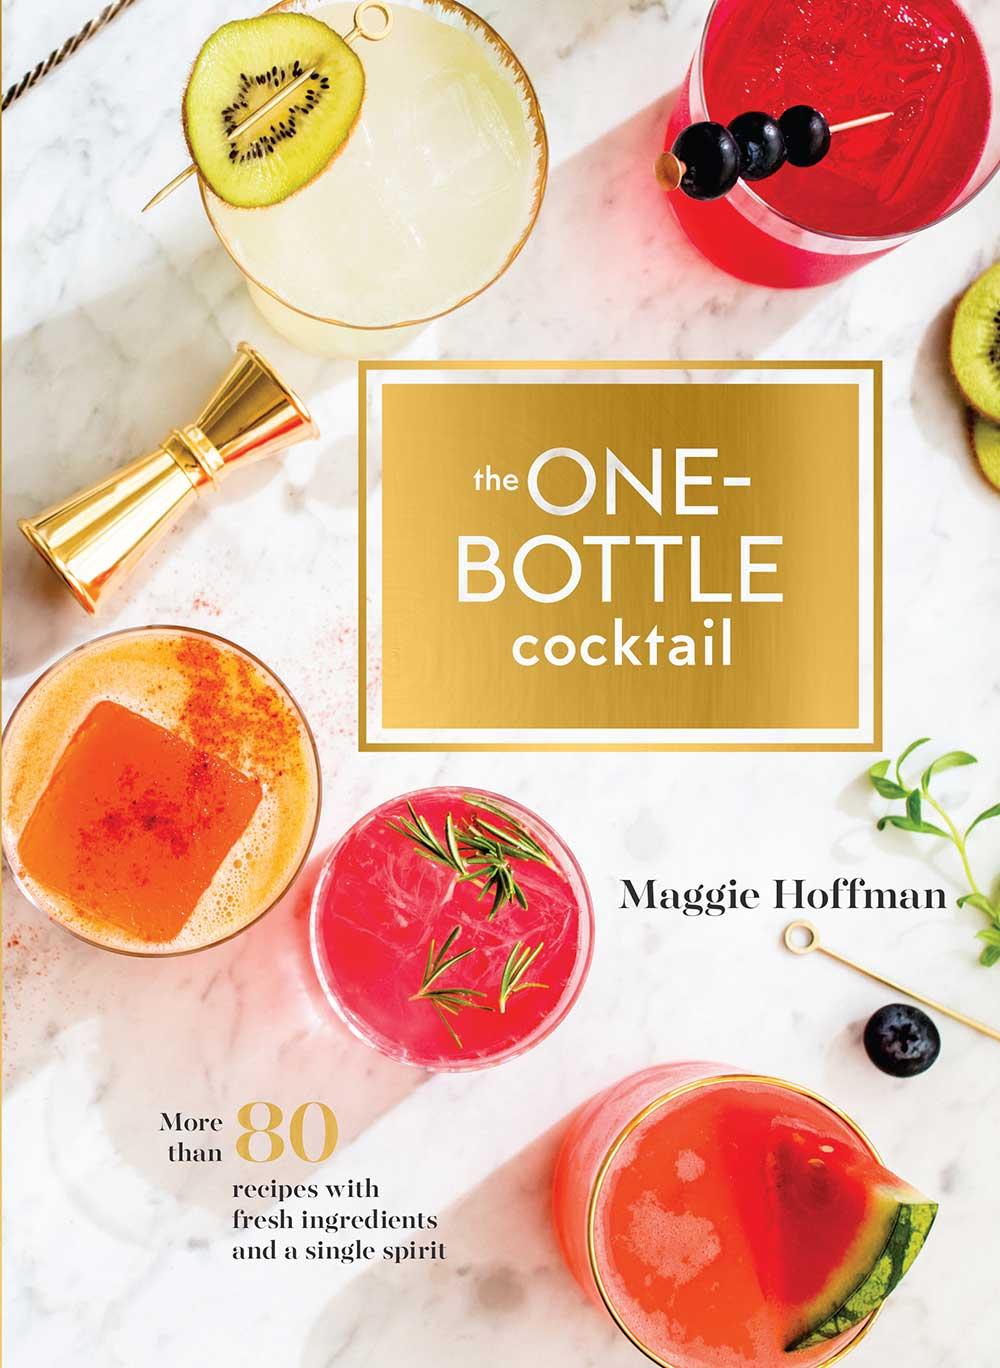 httpswww.saveur.comsitessaveur.comfilesimages201712hoff_one-bottle-cocktail.jpg